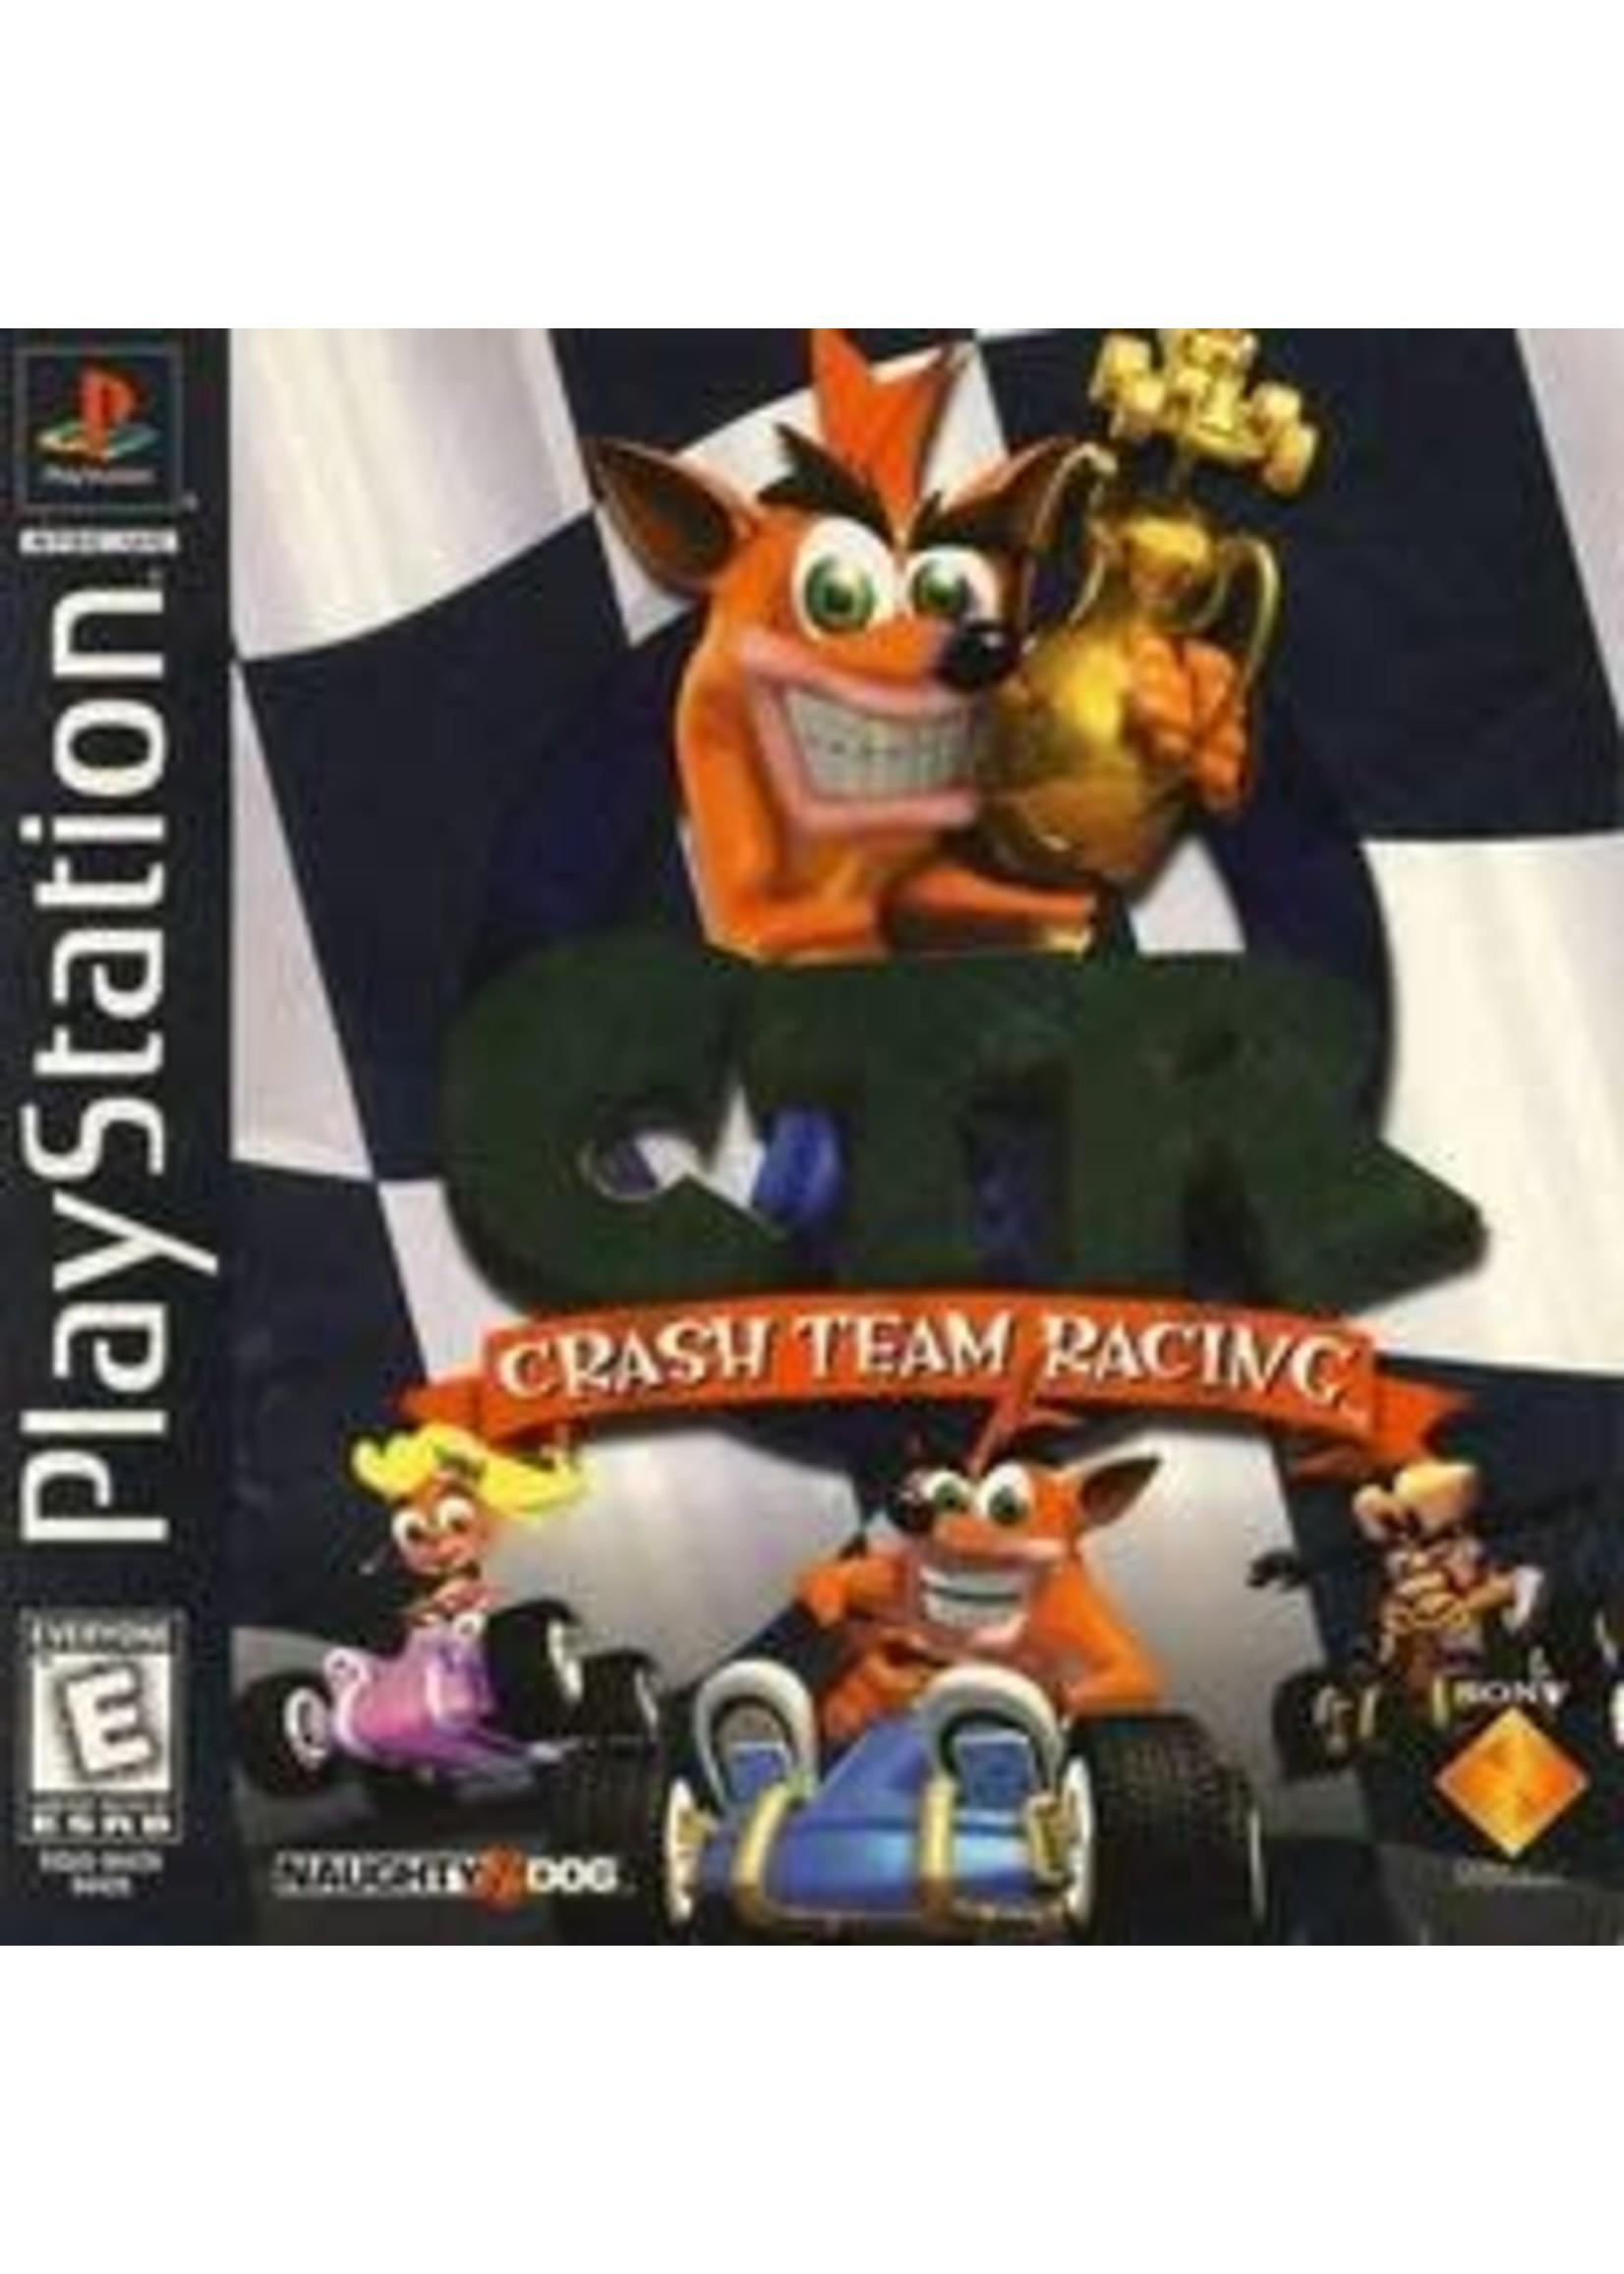 CTR Crash Team Racing Playstation